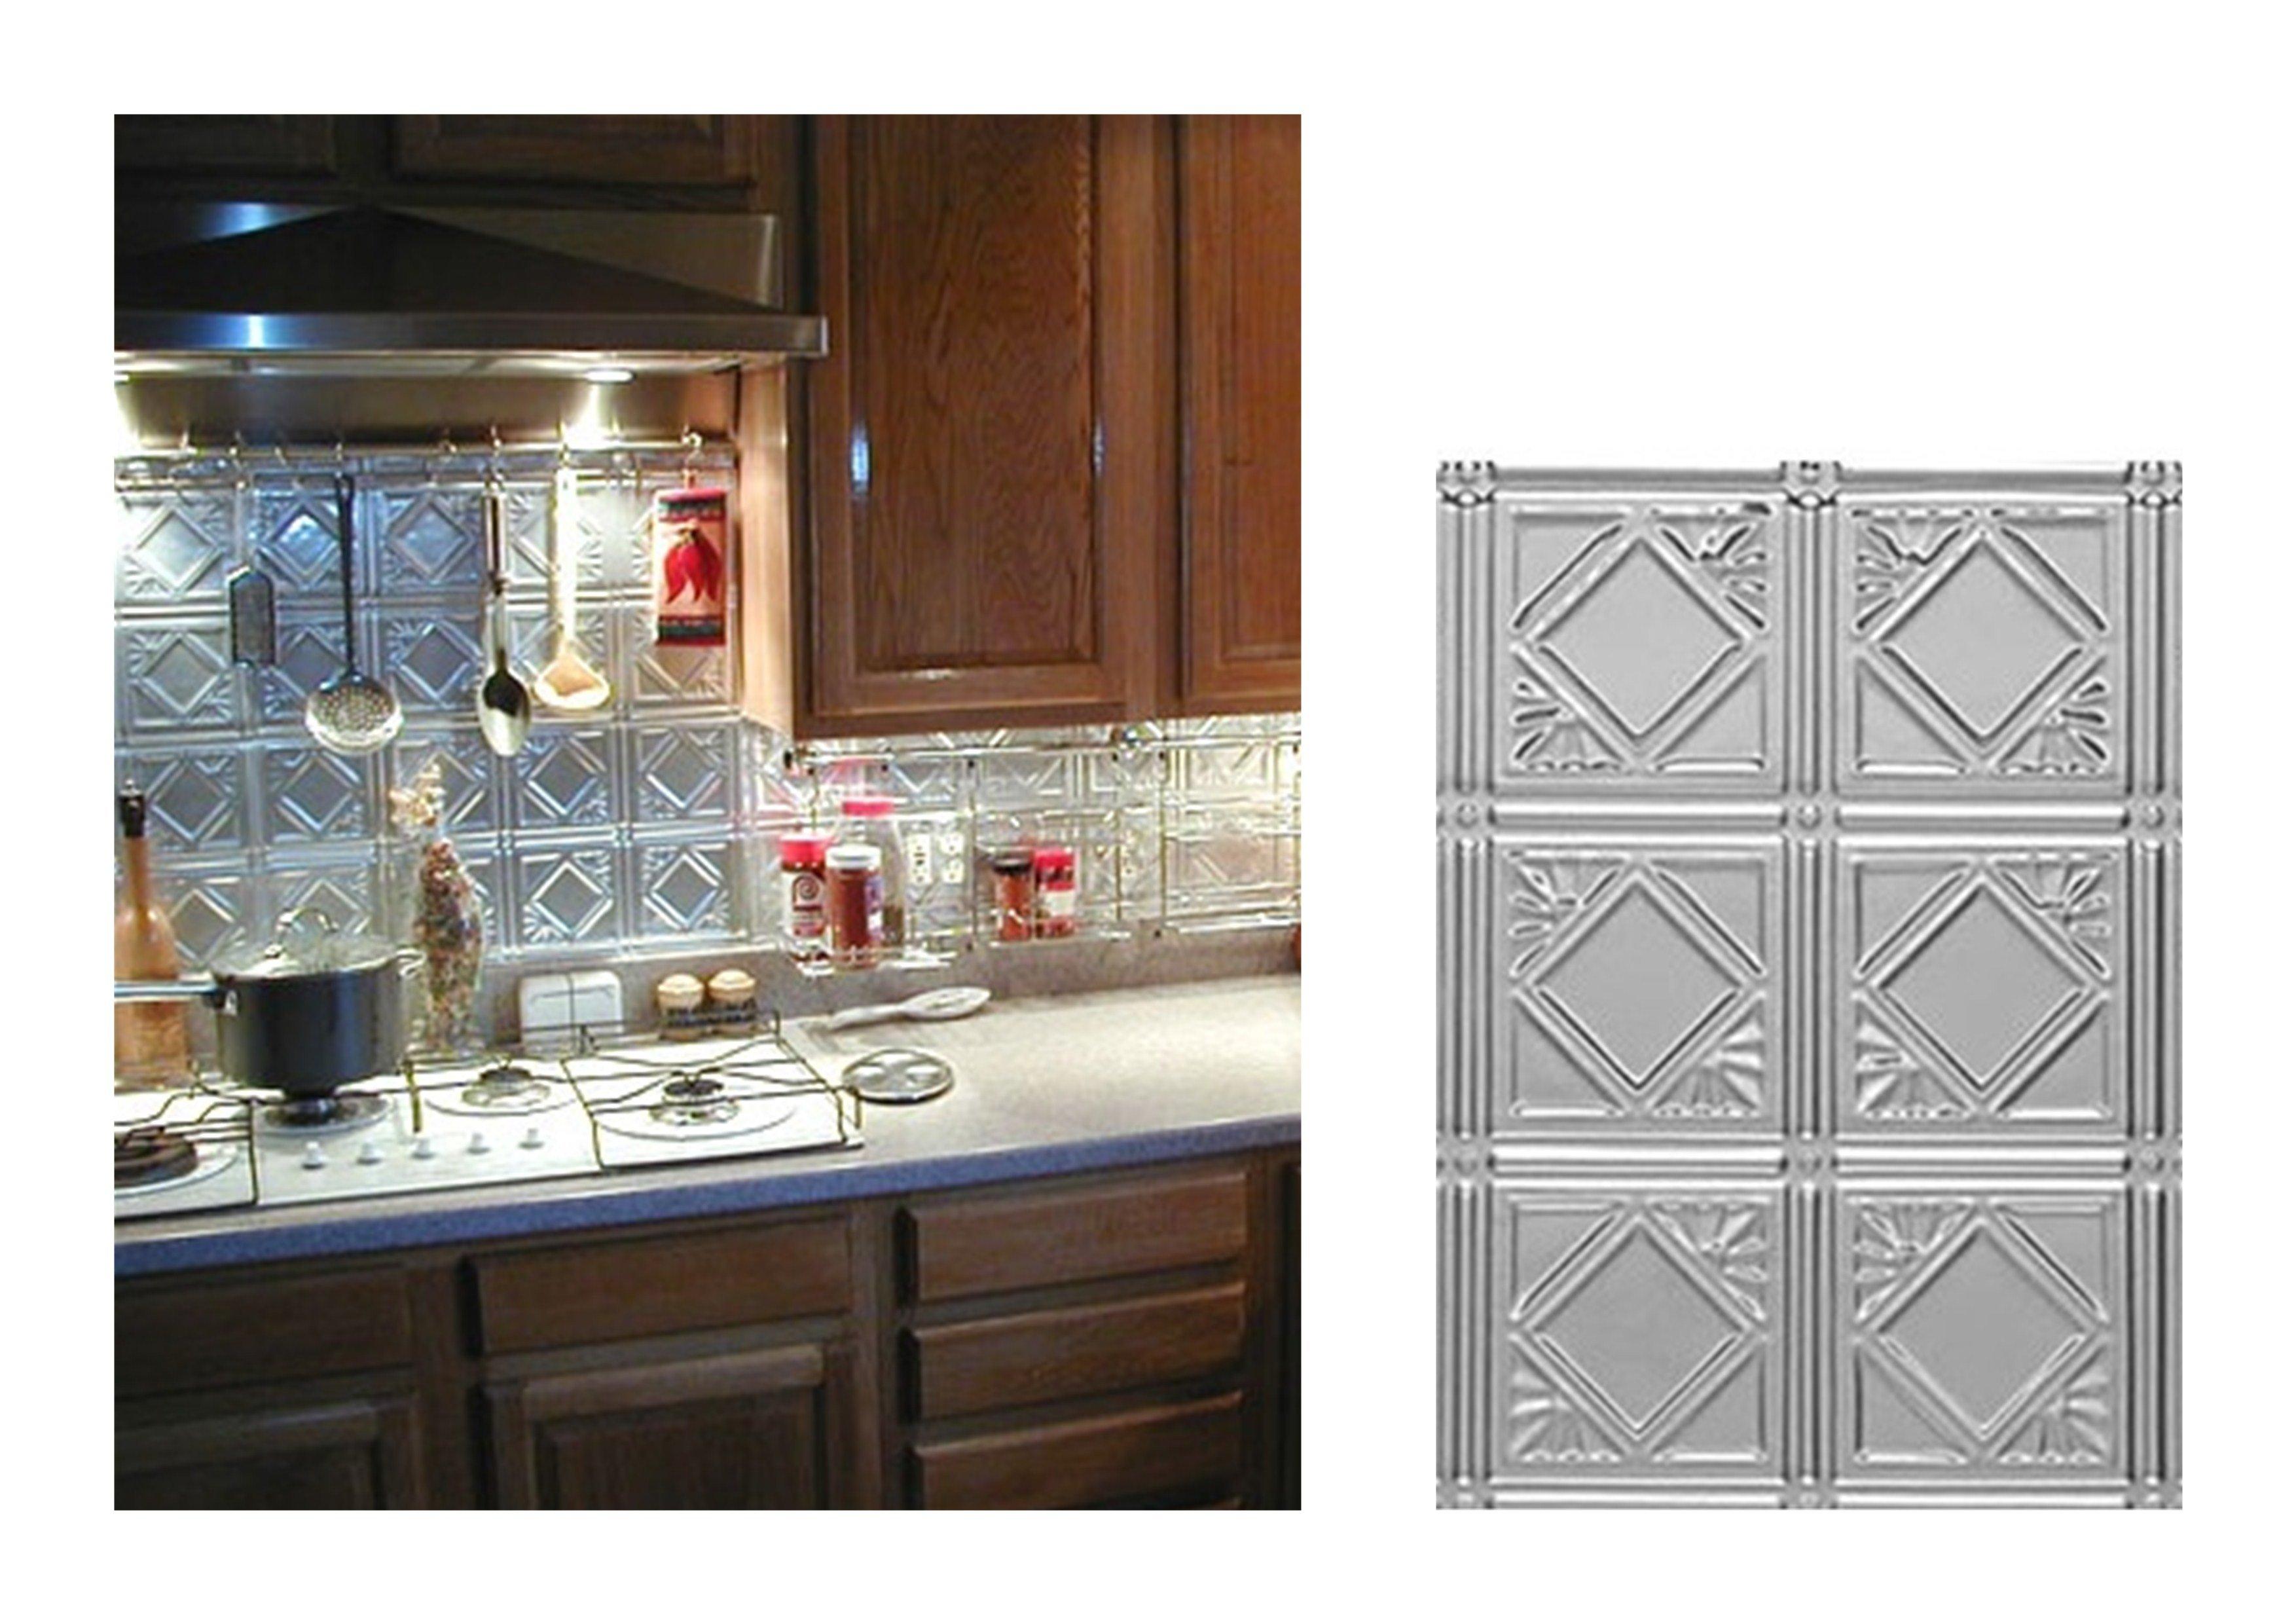 kitchen diamondback square metal backsplash decorative ceiling interior designs modern kitchen backsplash ideas metal tile options